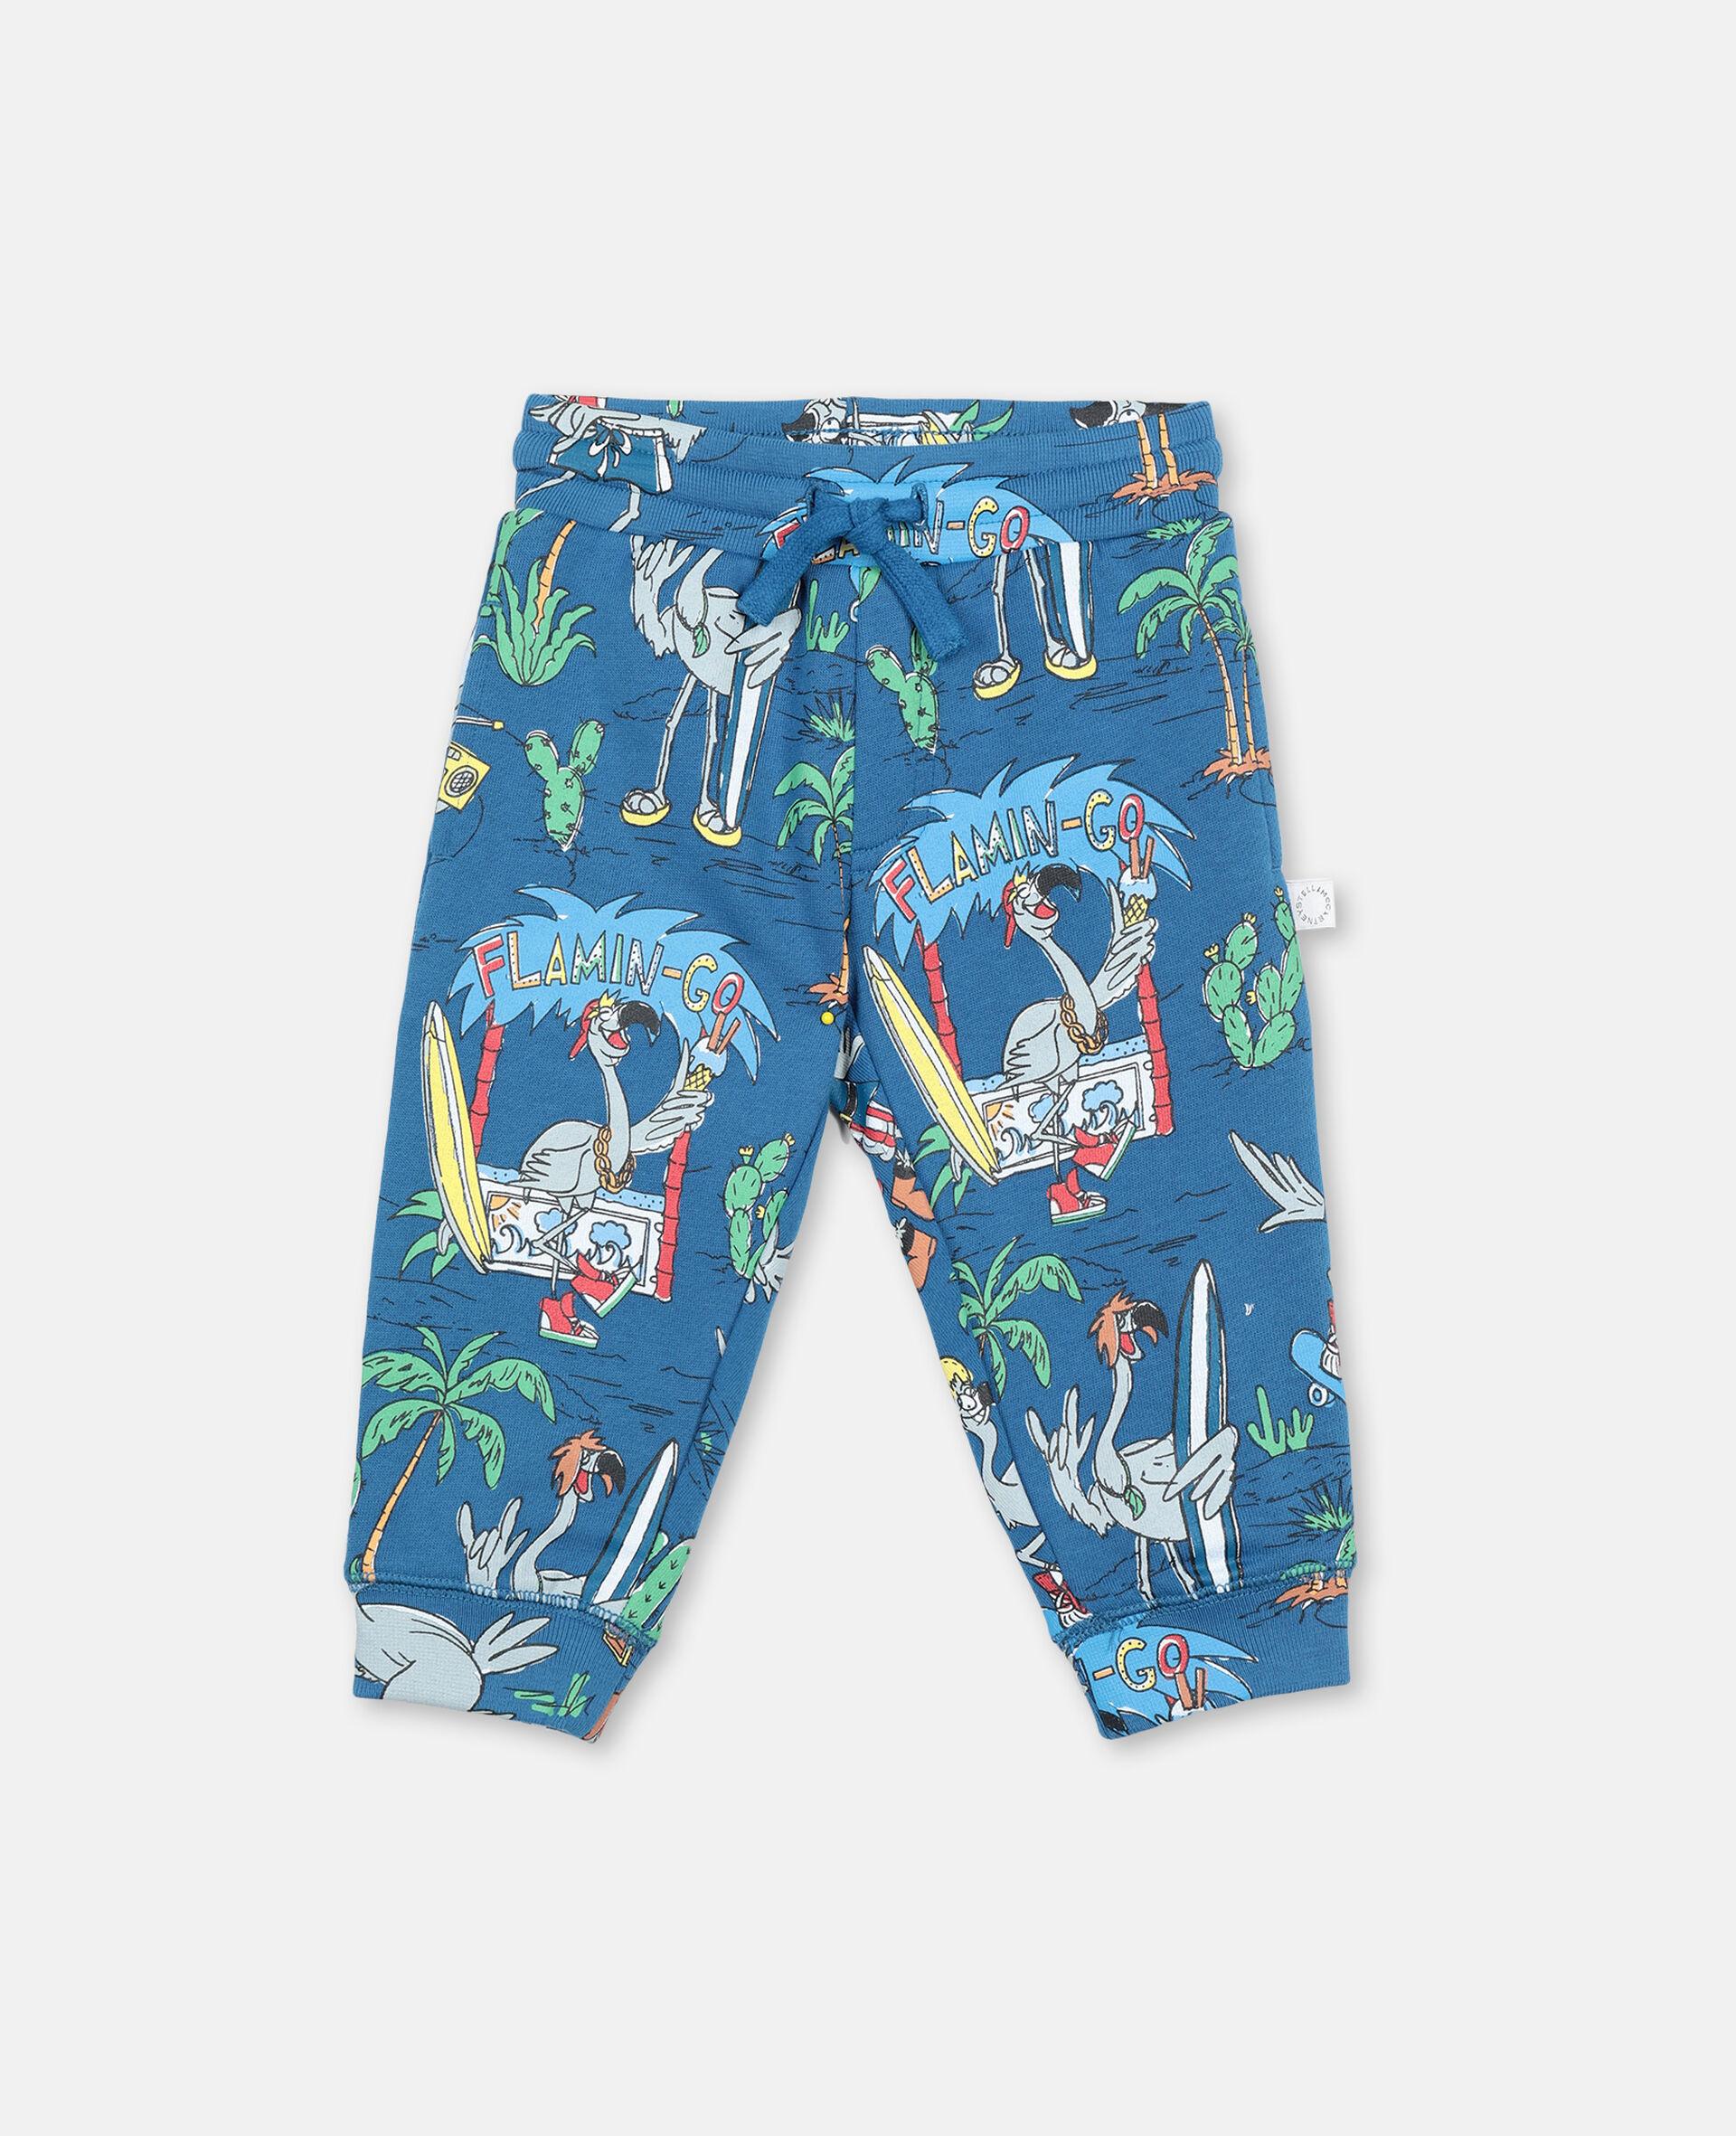 Flamingo Land Cotton Sweatpants-Blue-large image number 0